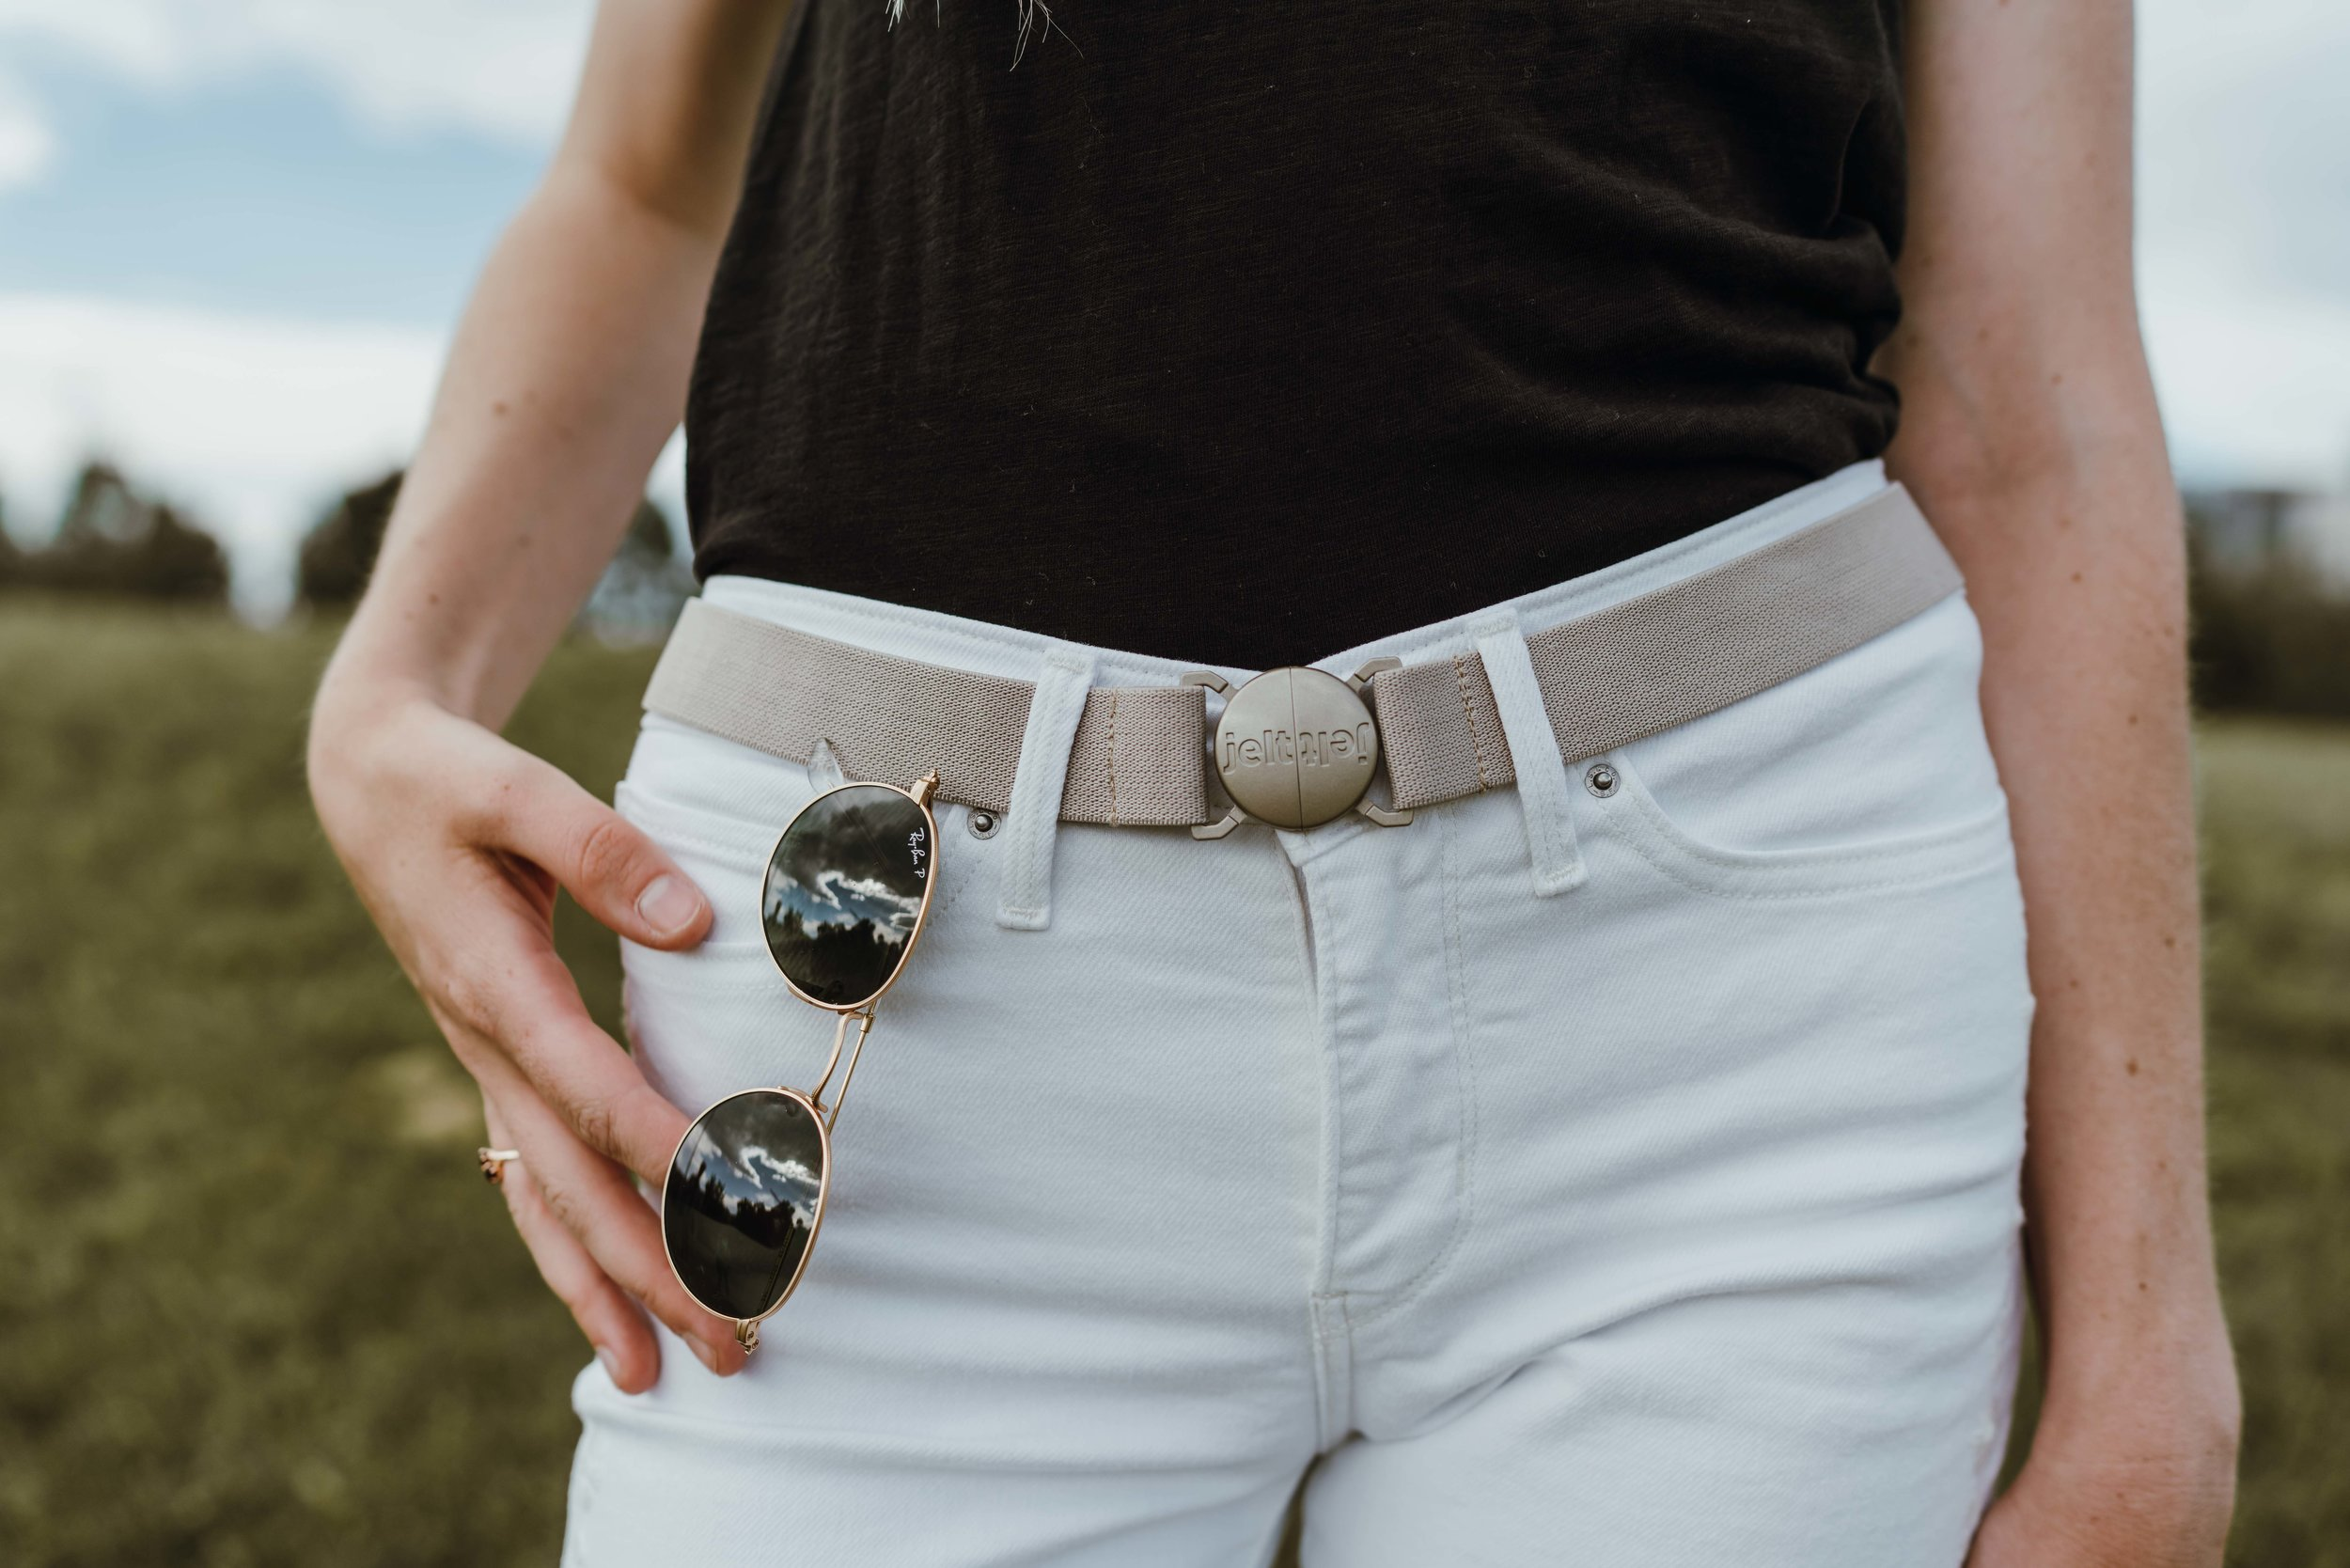 denver photographer commercial lifestyle shoot with Jelt Belt outdoor brand - DSC02392.jpg